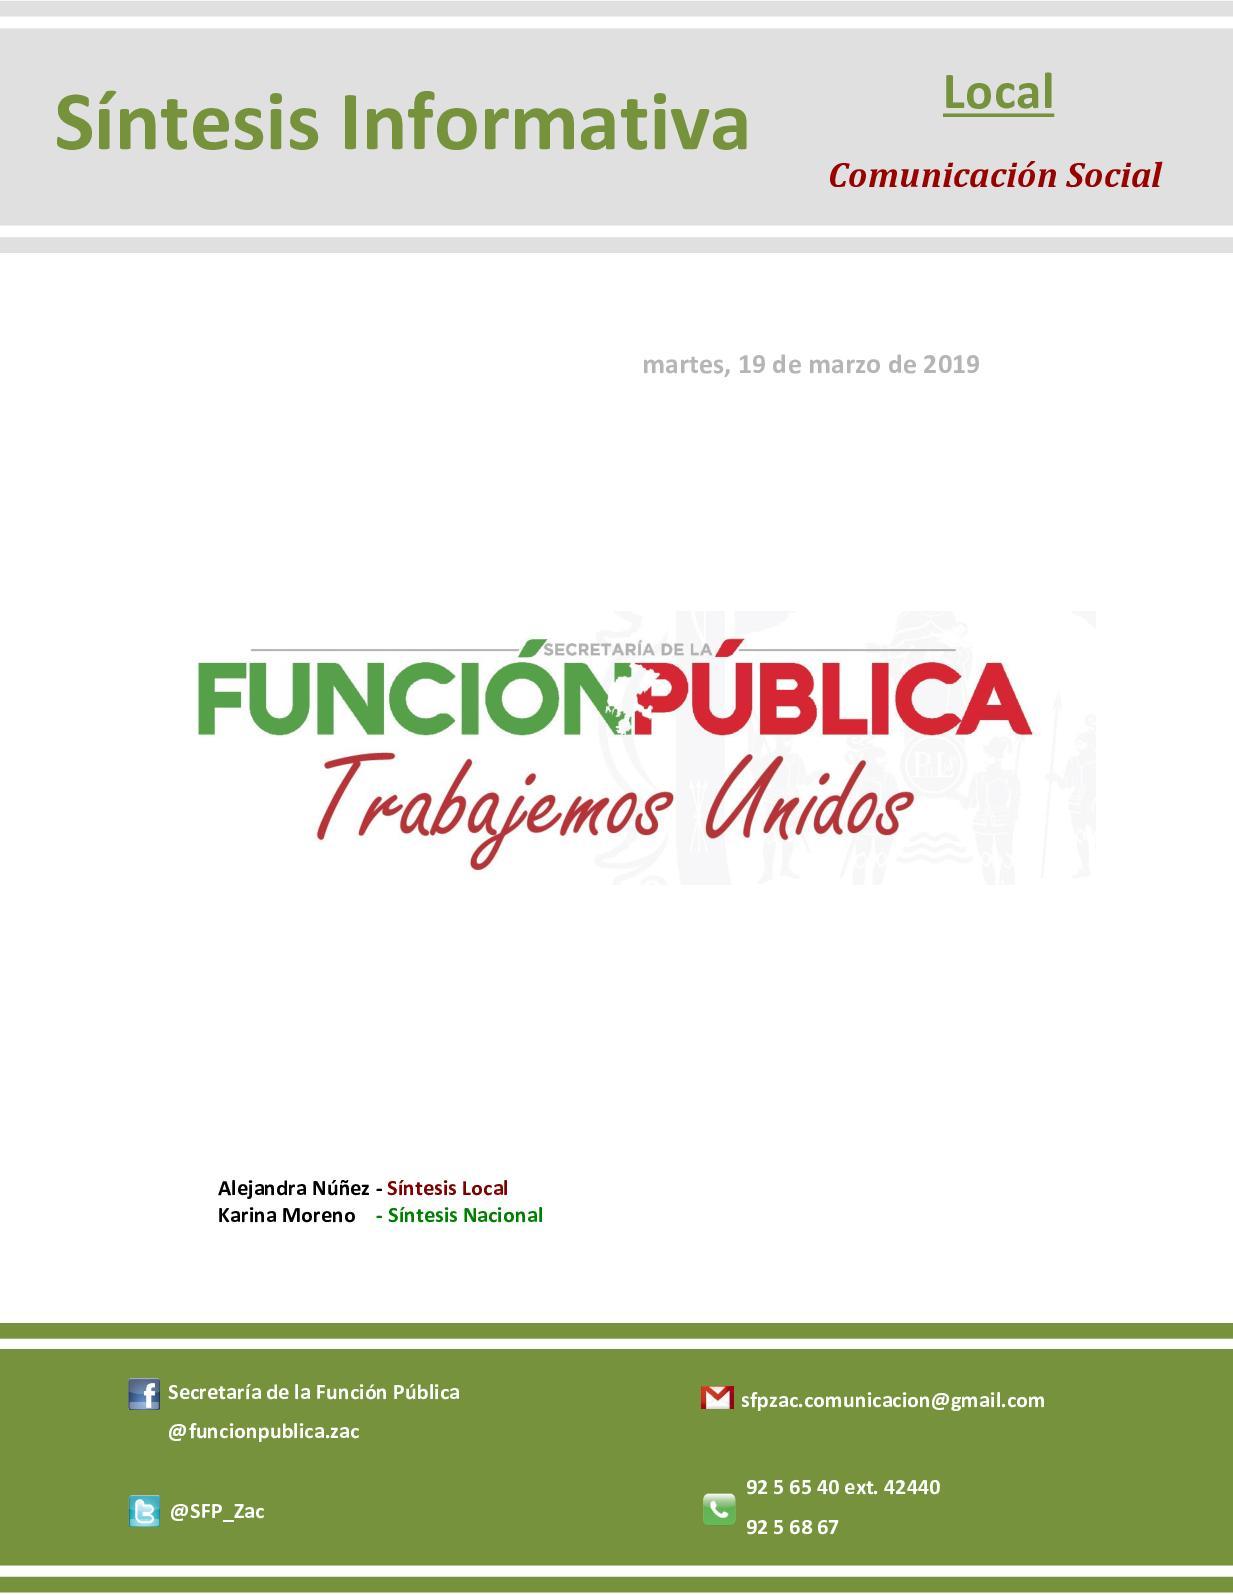 Síntesis Local-Nacional de Comunicación Social de la SFP 19-03-2019